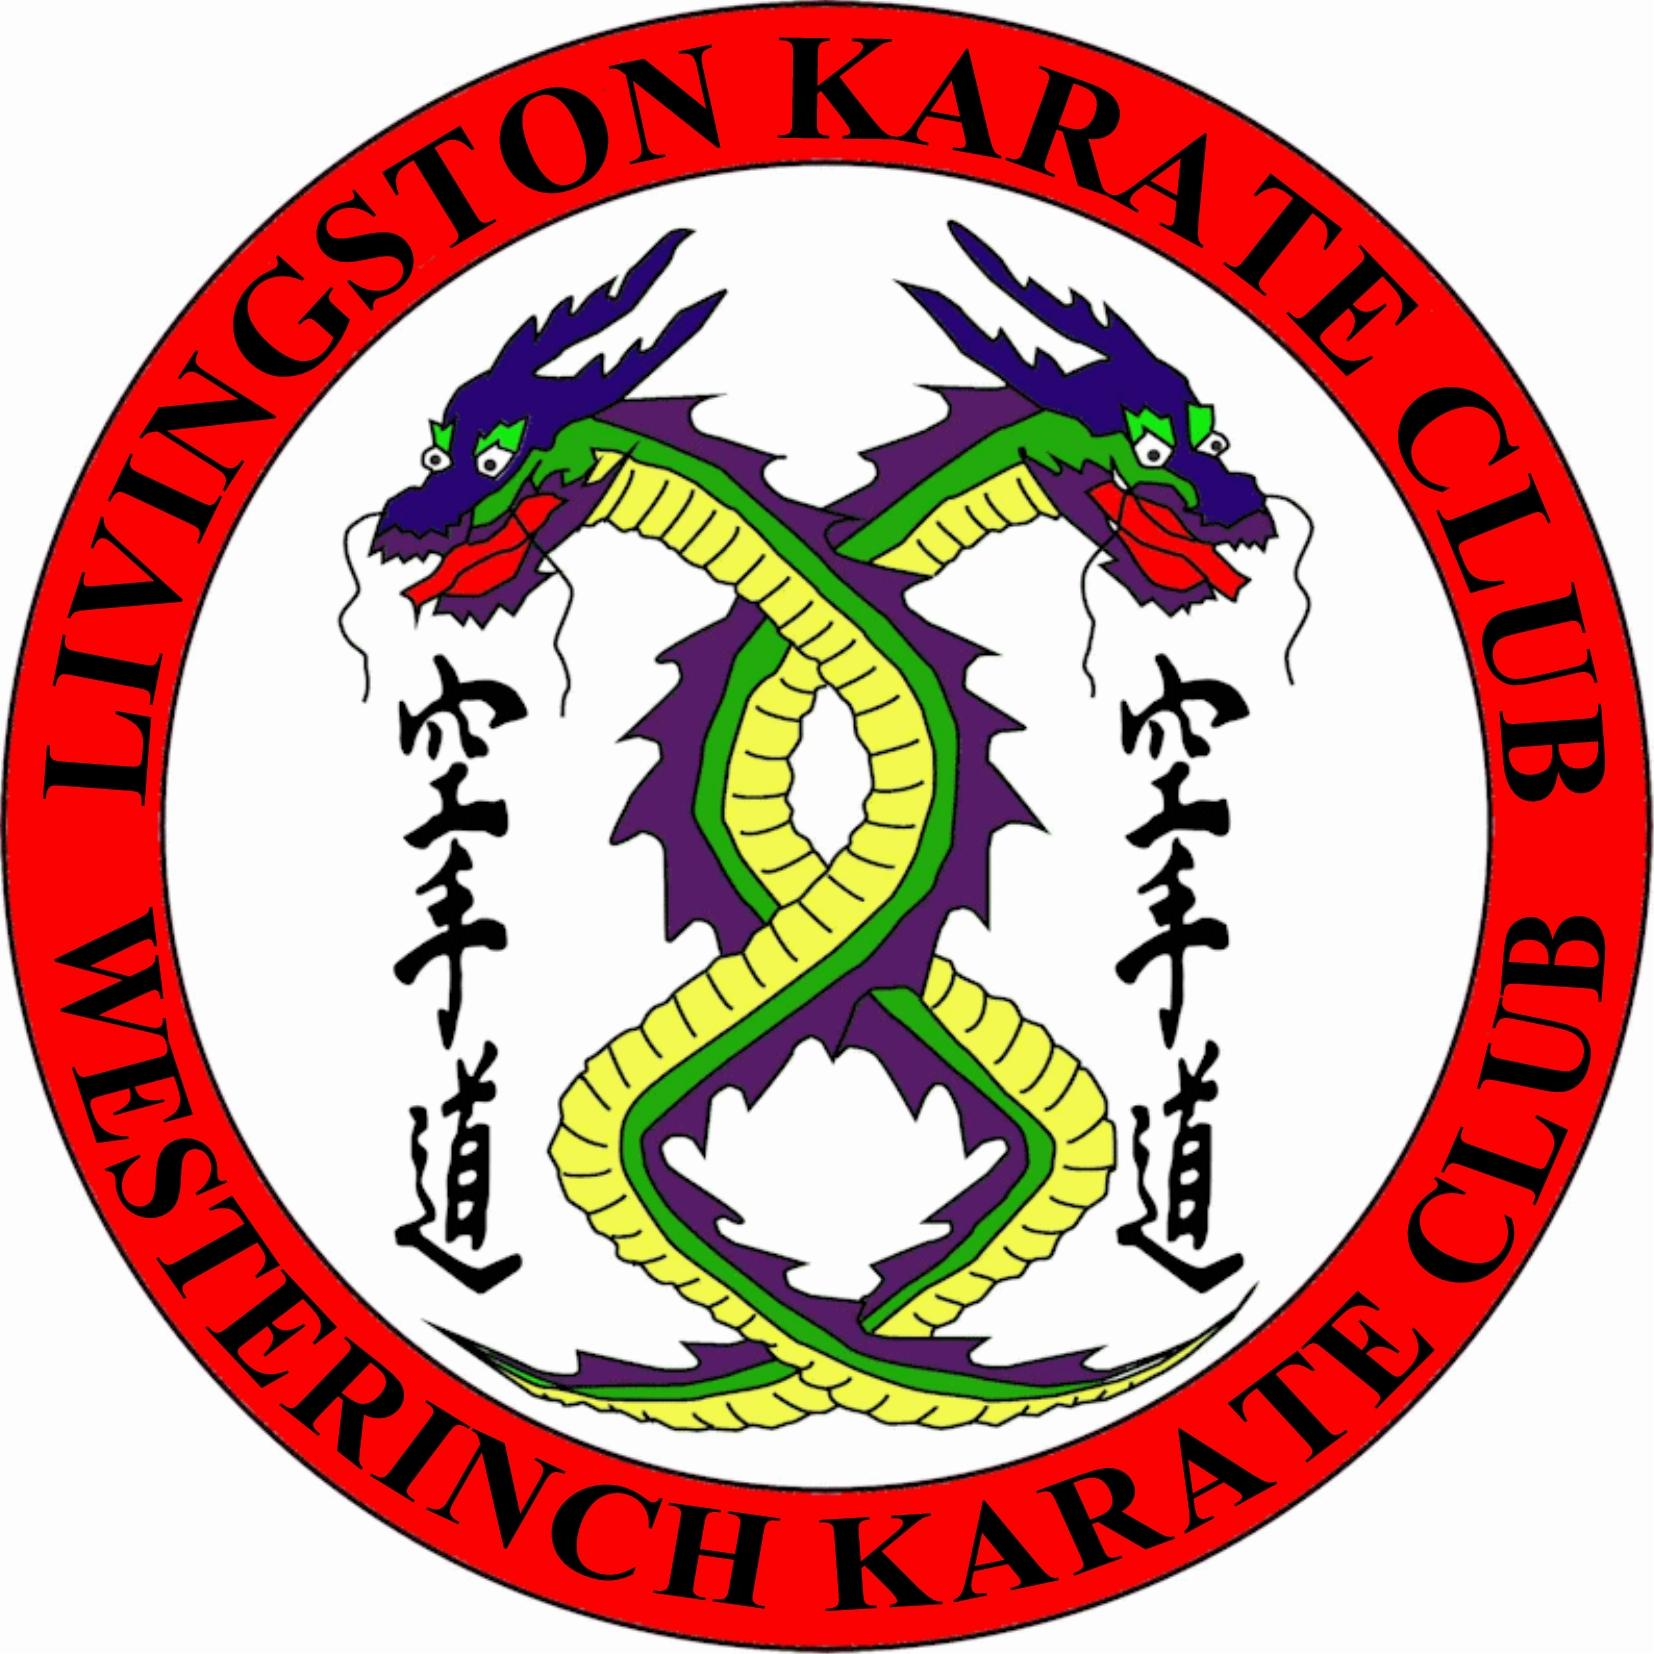 Livingston Karate Club Logo